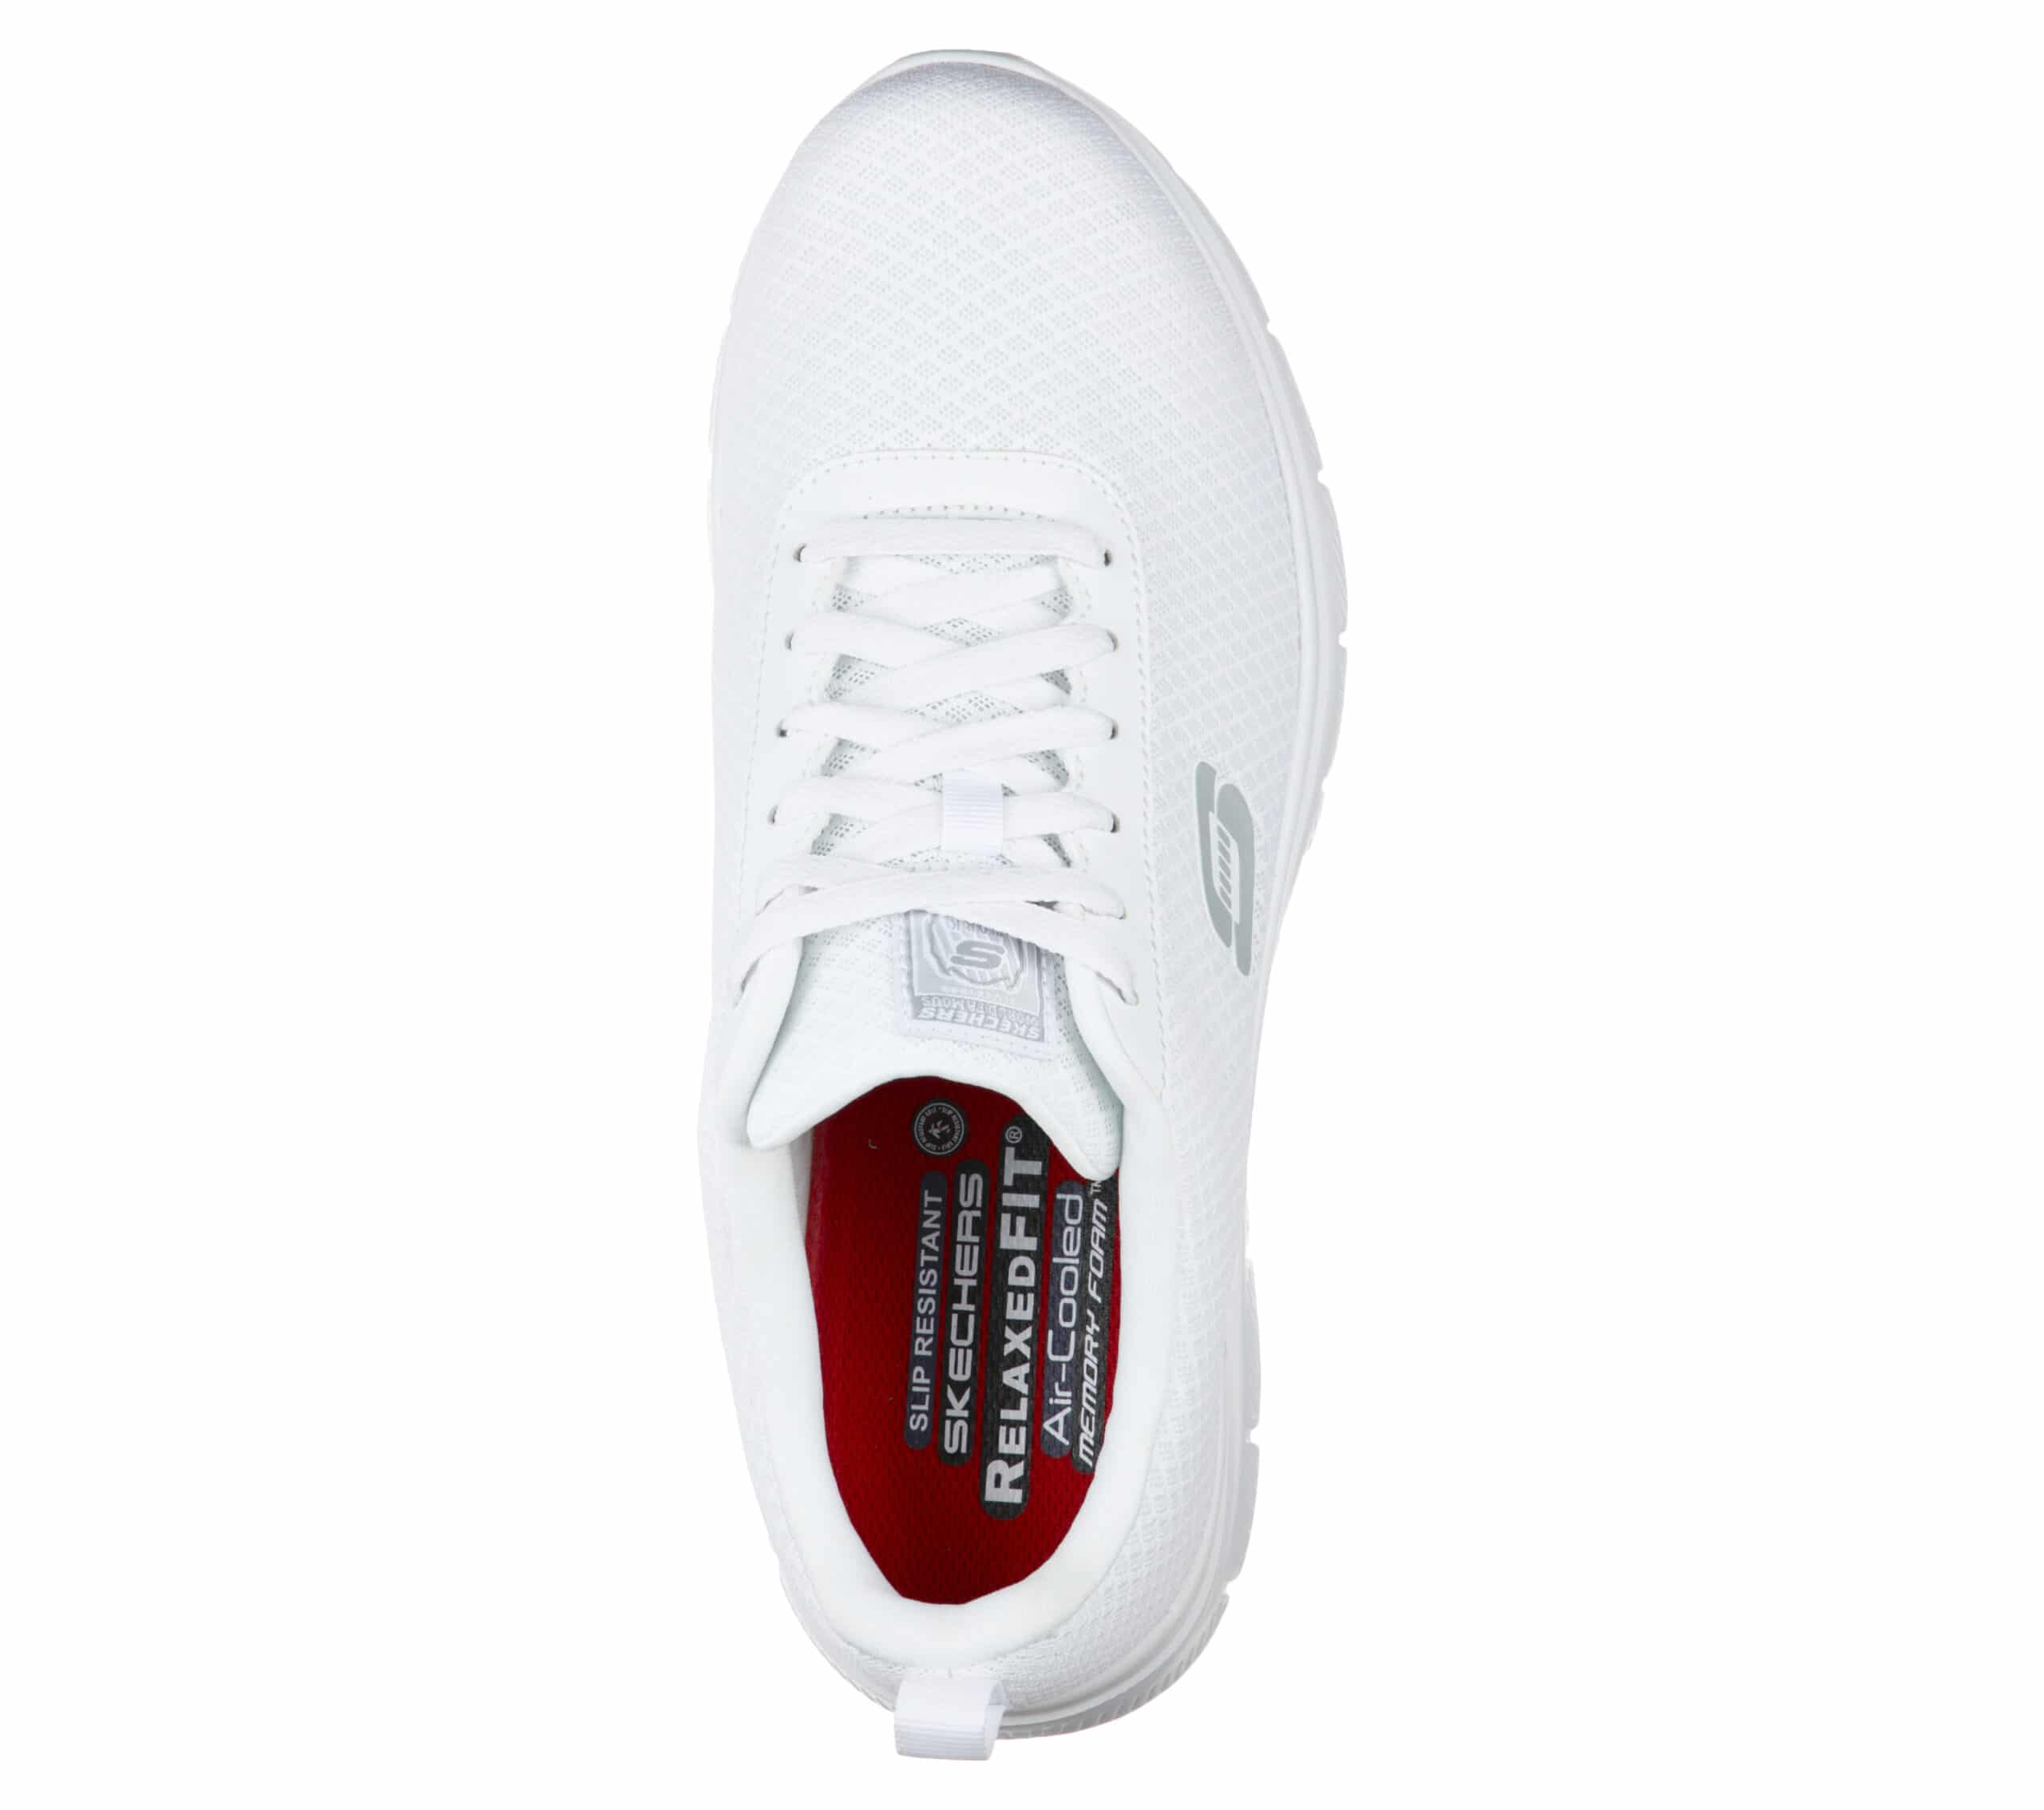 Skechers Sk77125ec Bendon Hombre Blanco 4